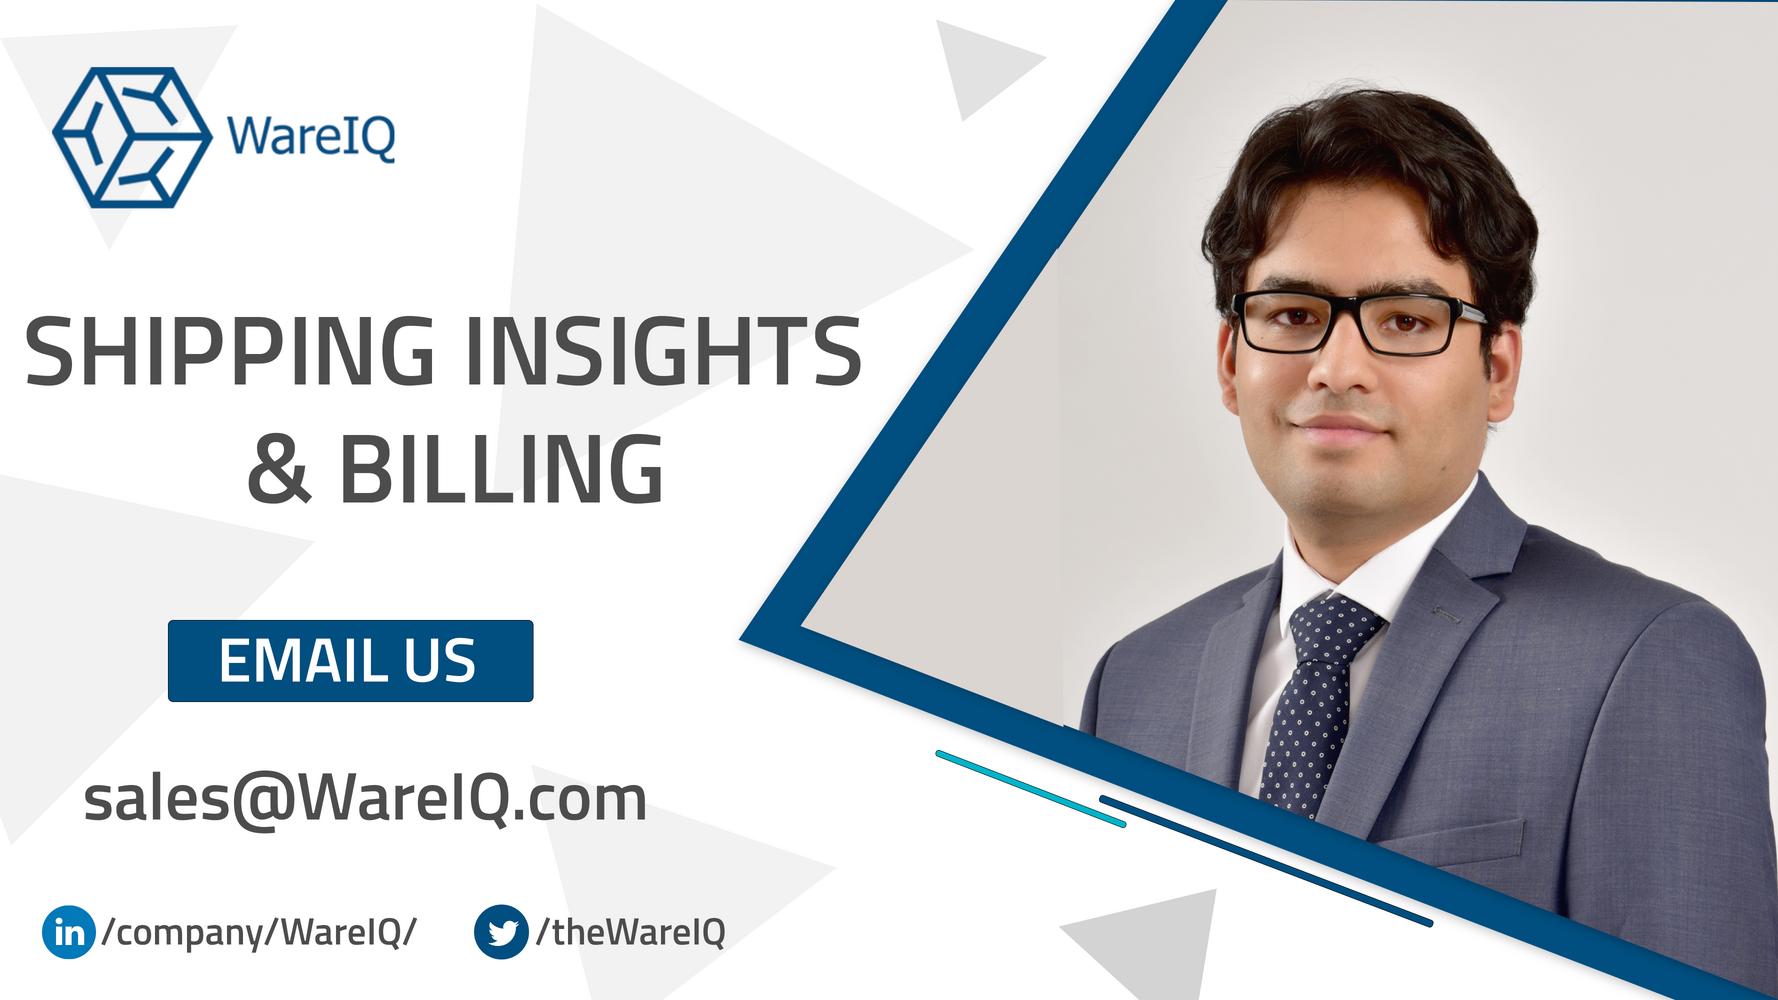 WareIQ Shipping Insights & Billing